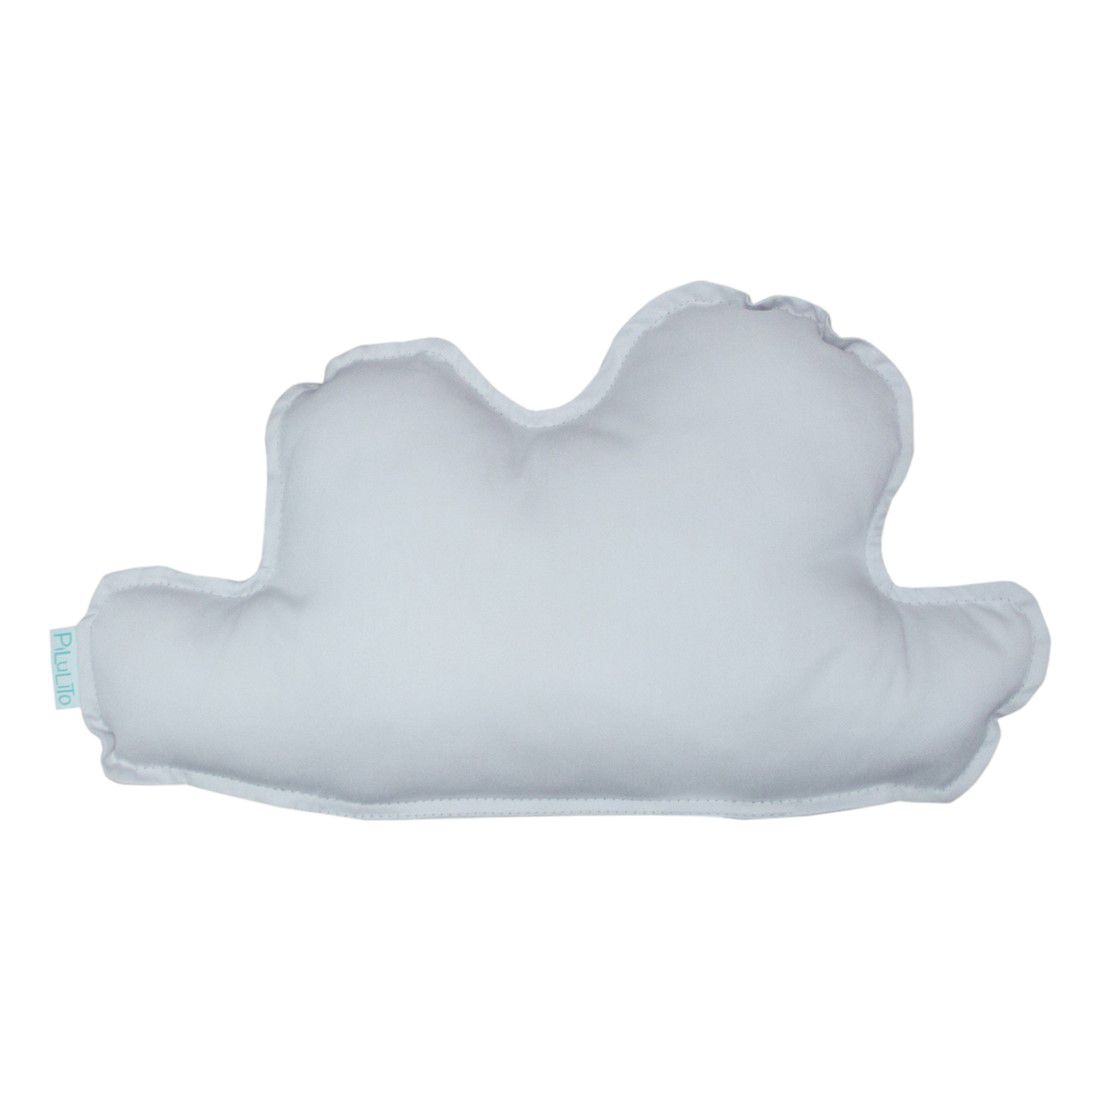 Almofada nuvem pequena  branca